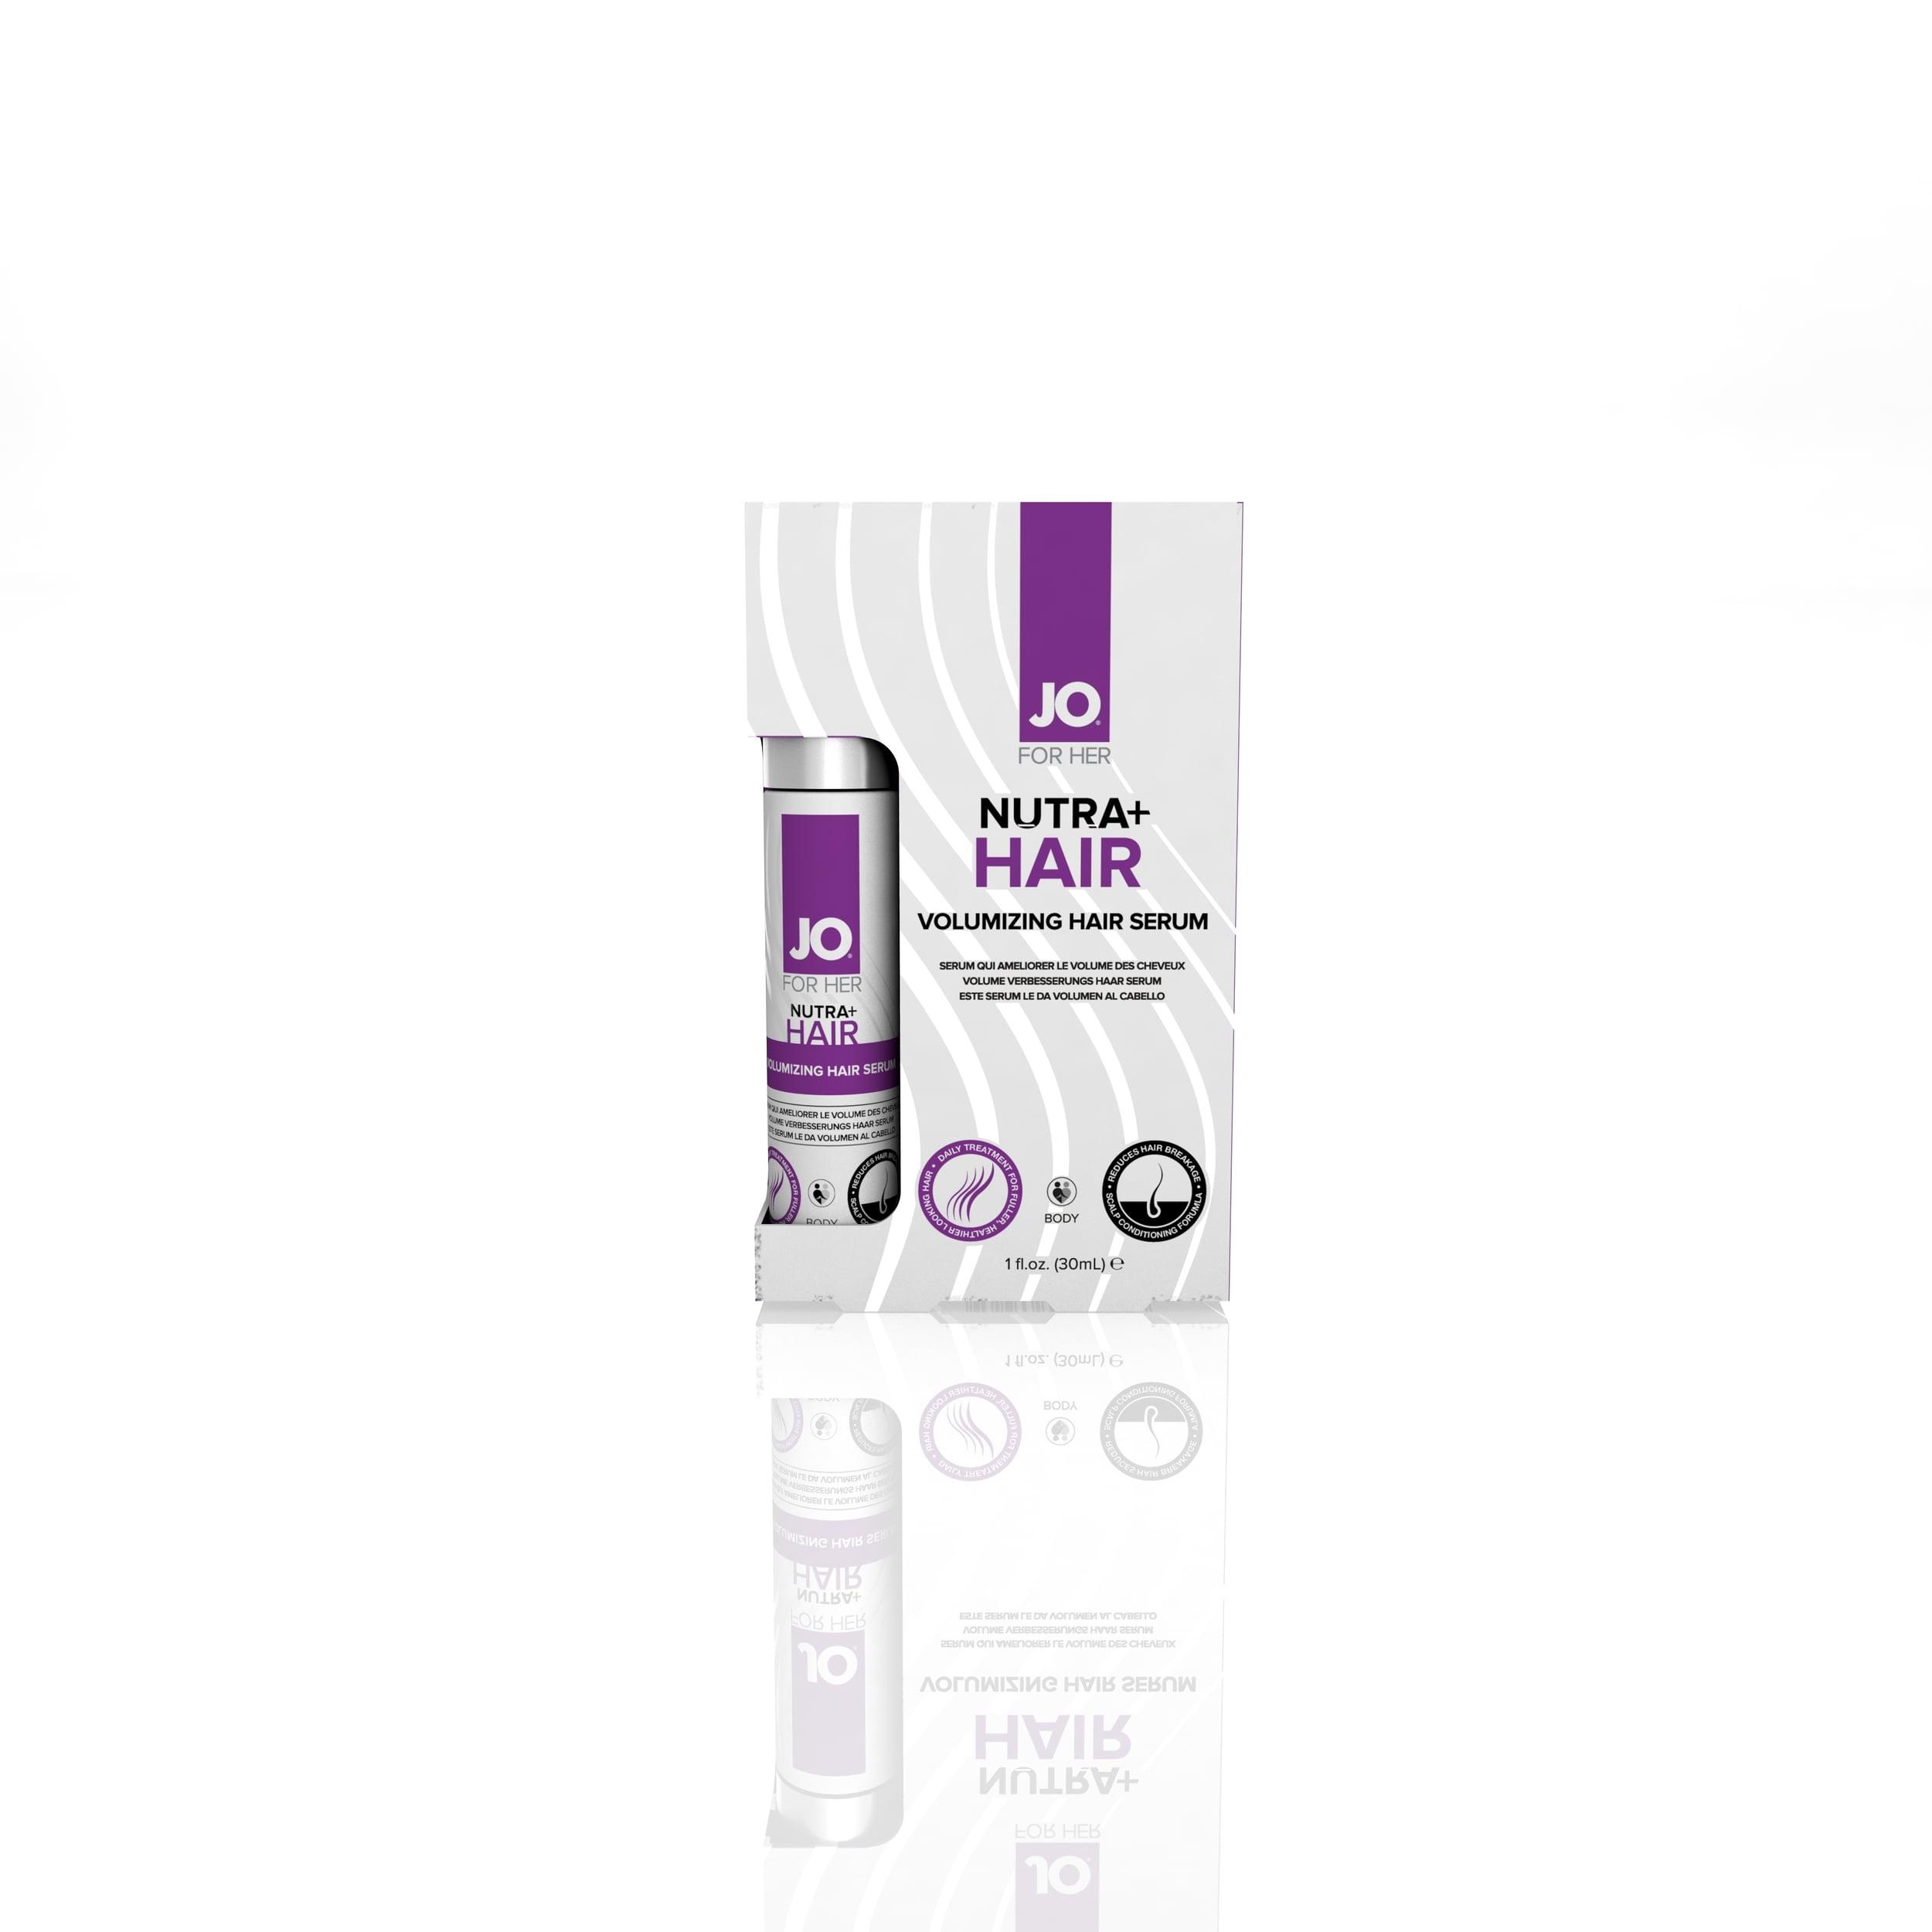 41054 - JO NUTRA+ HAIR VOLUMIZER SERUM - FOR HER - 1fl.oz30mL.jpg